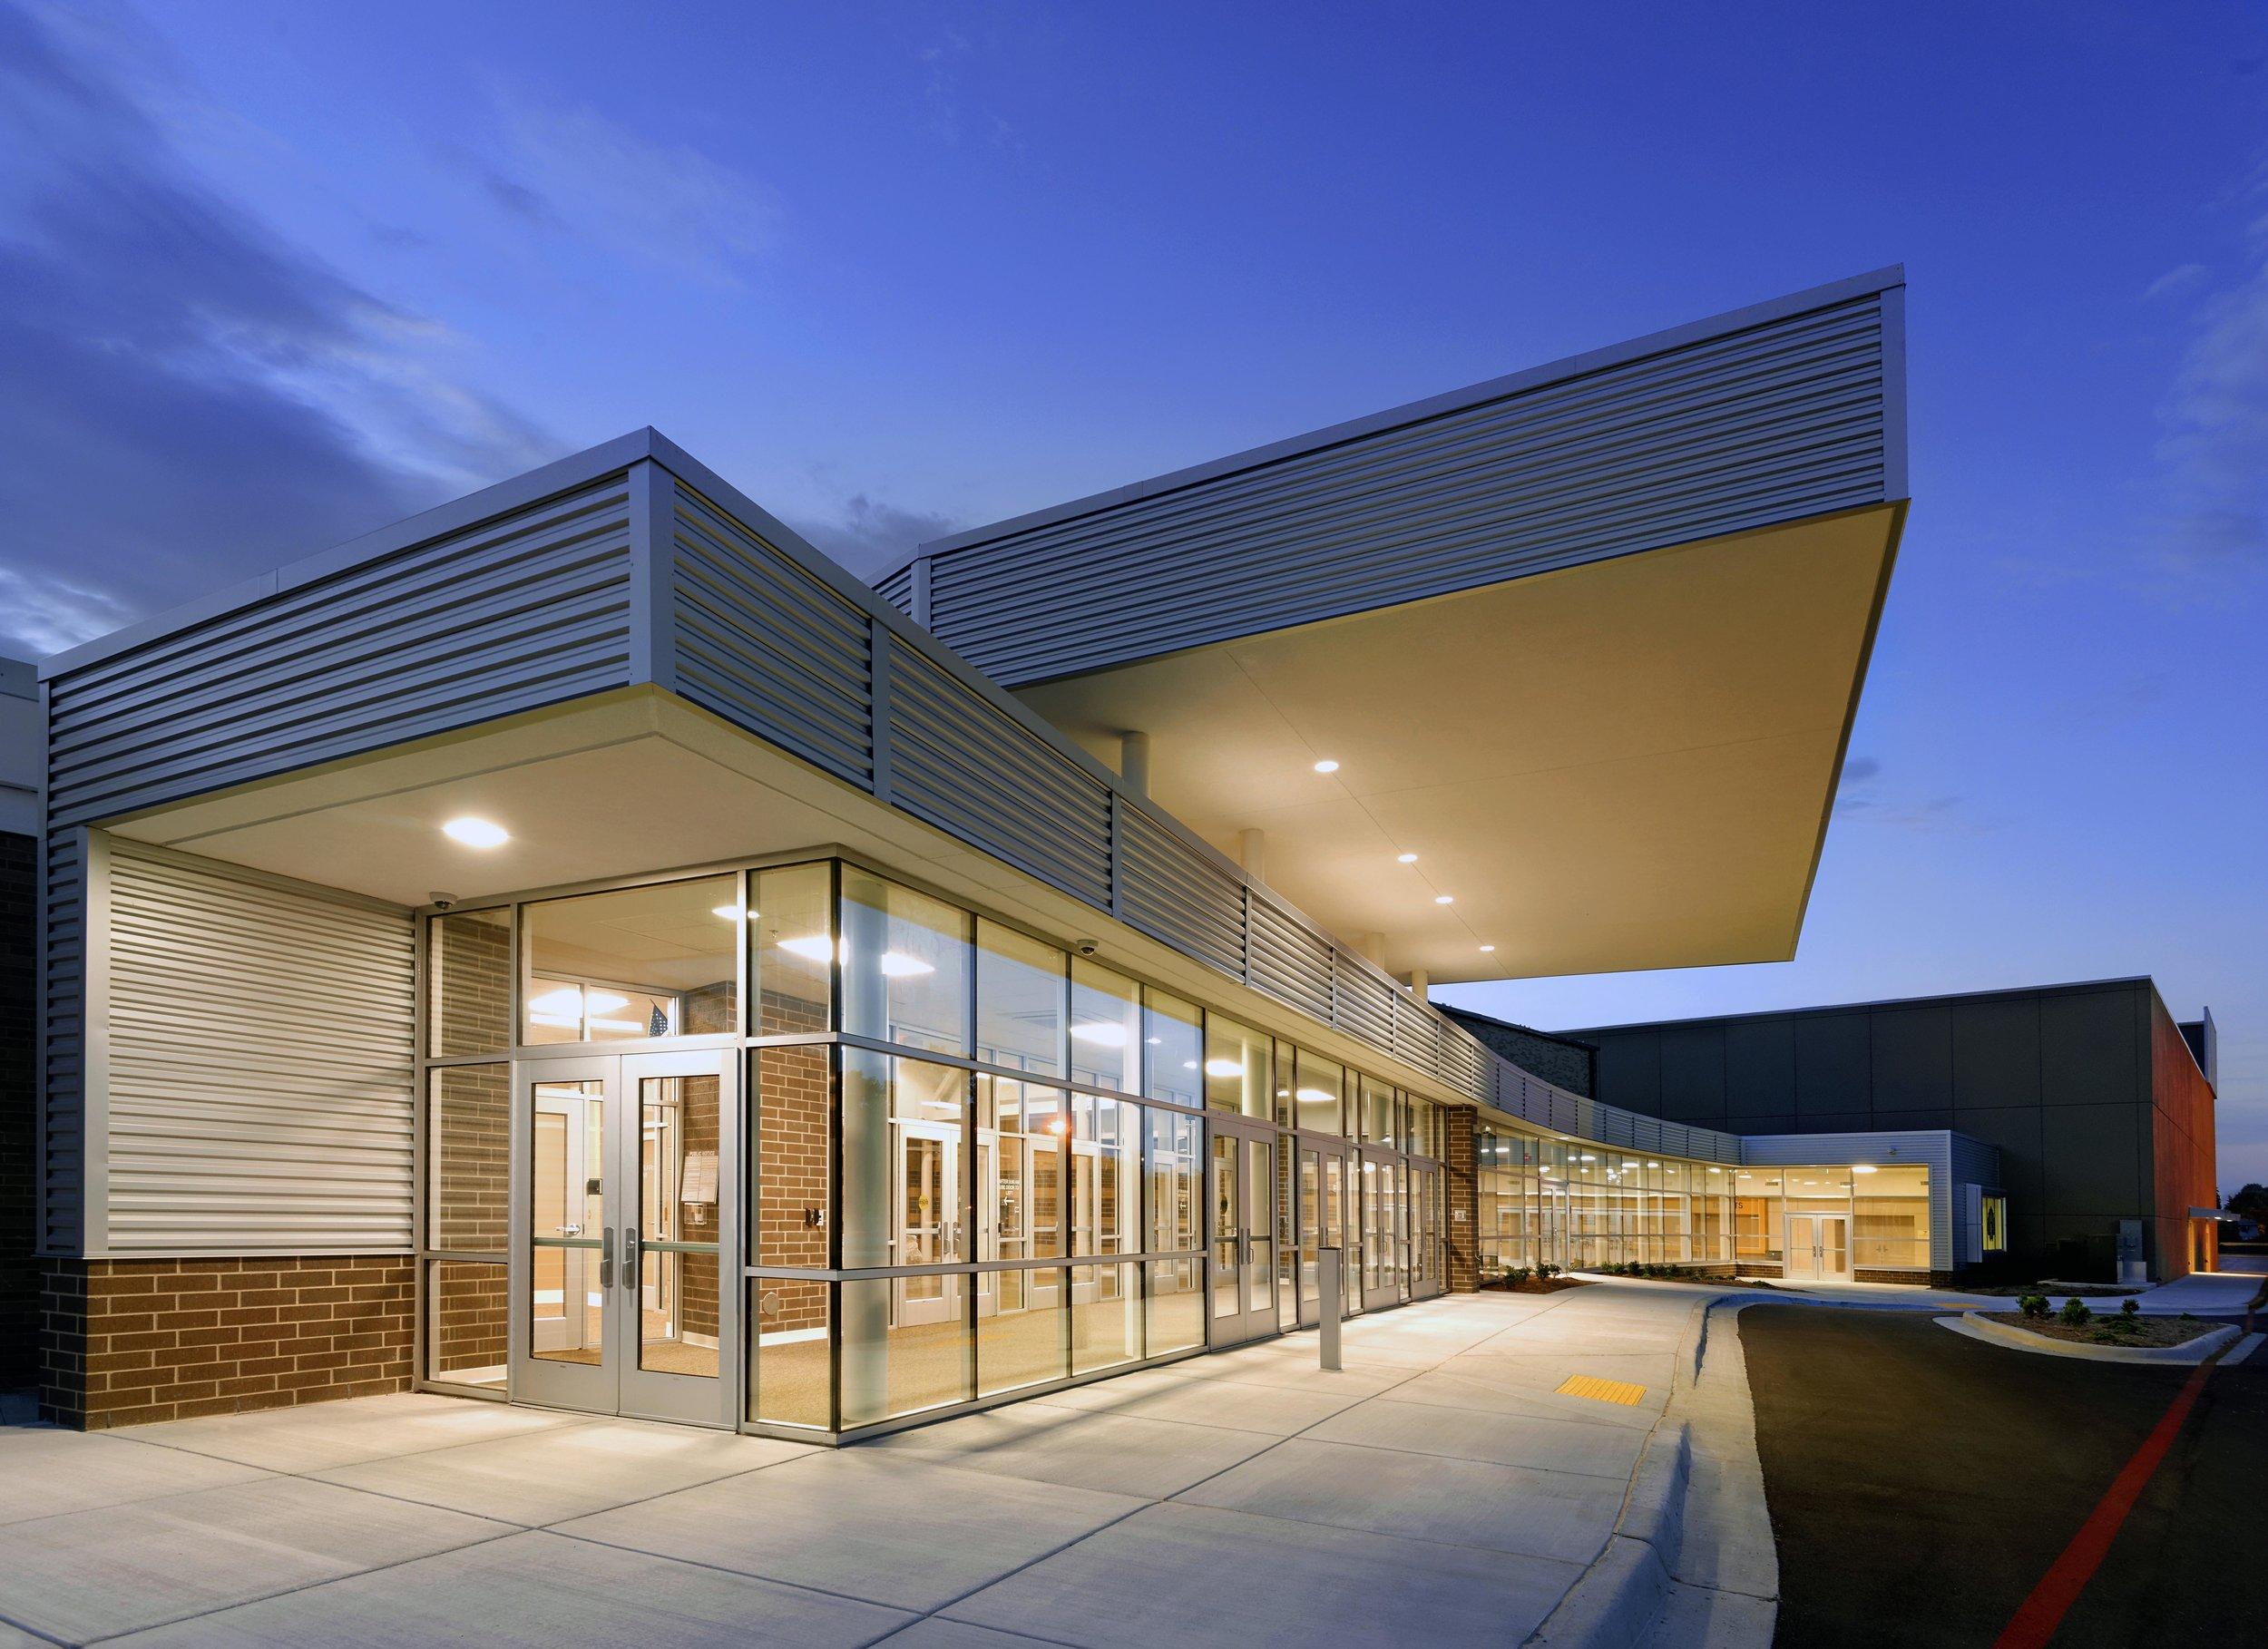 KICKAPOO HIGH SCHOOL RENOVATION PHASE II